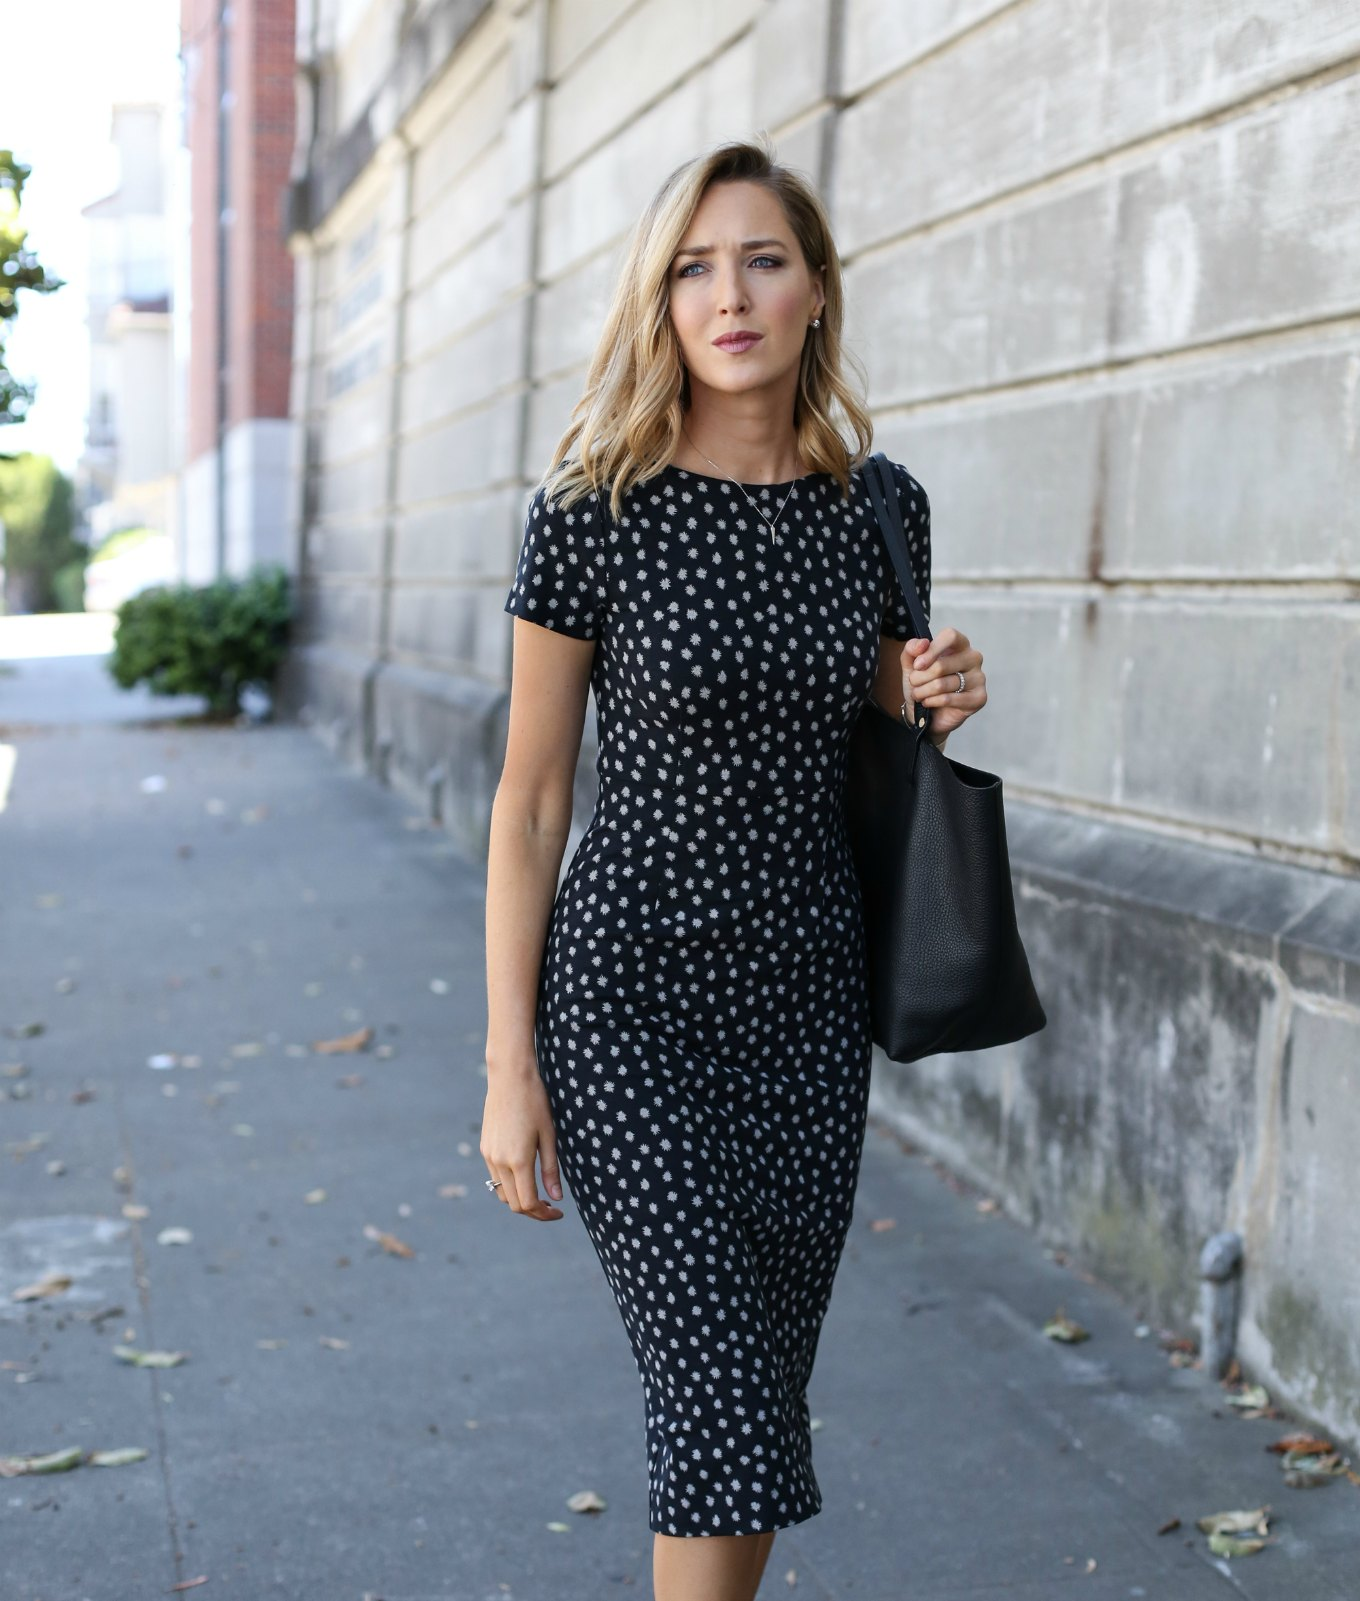 anthropologie-black-short-sleeve-sheath-dress-polka-dot-classic-work-wear-office-business-professional-women-style-fashion-(6) - Günün tarzı Benekli elbise